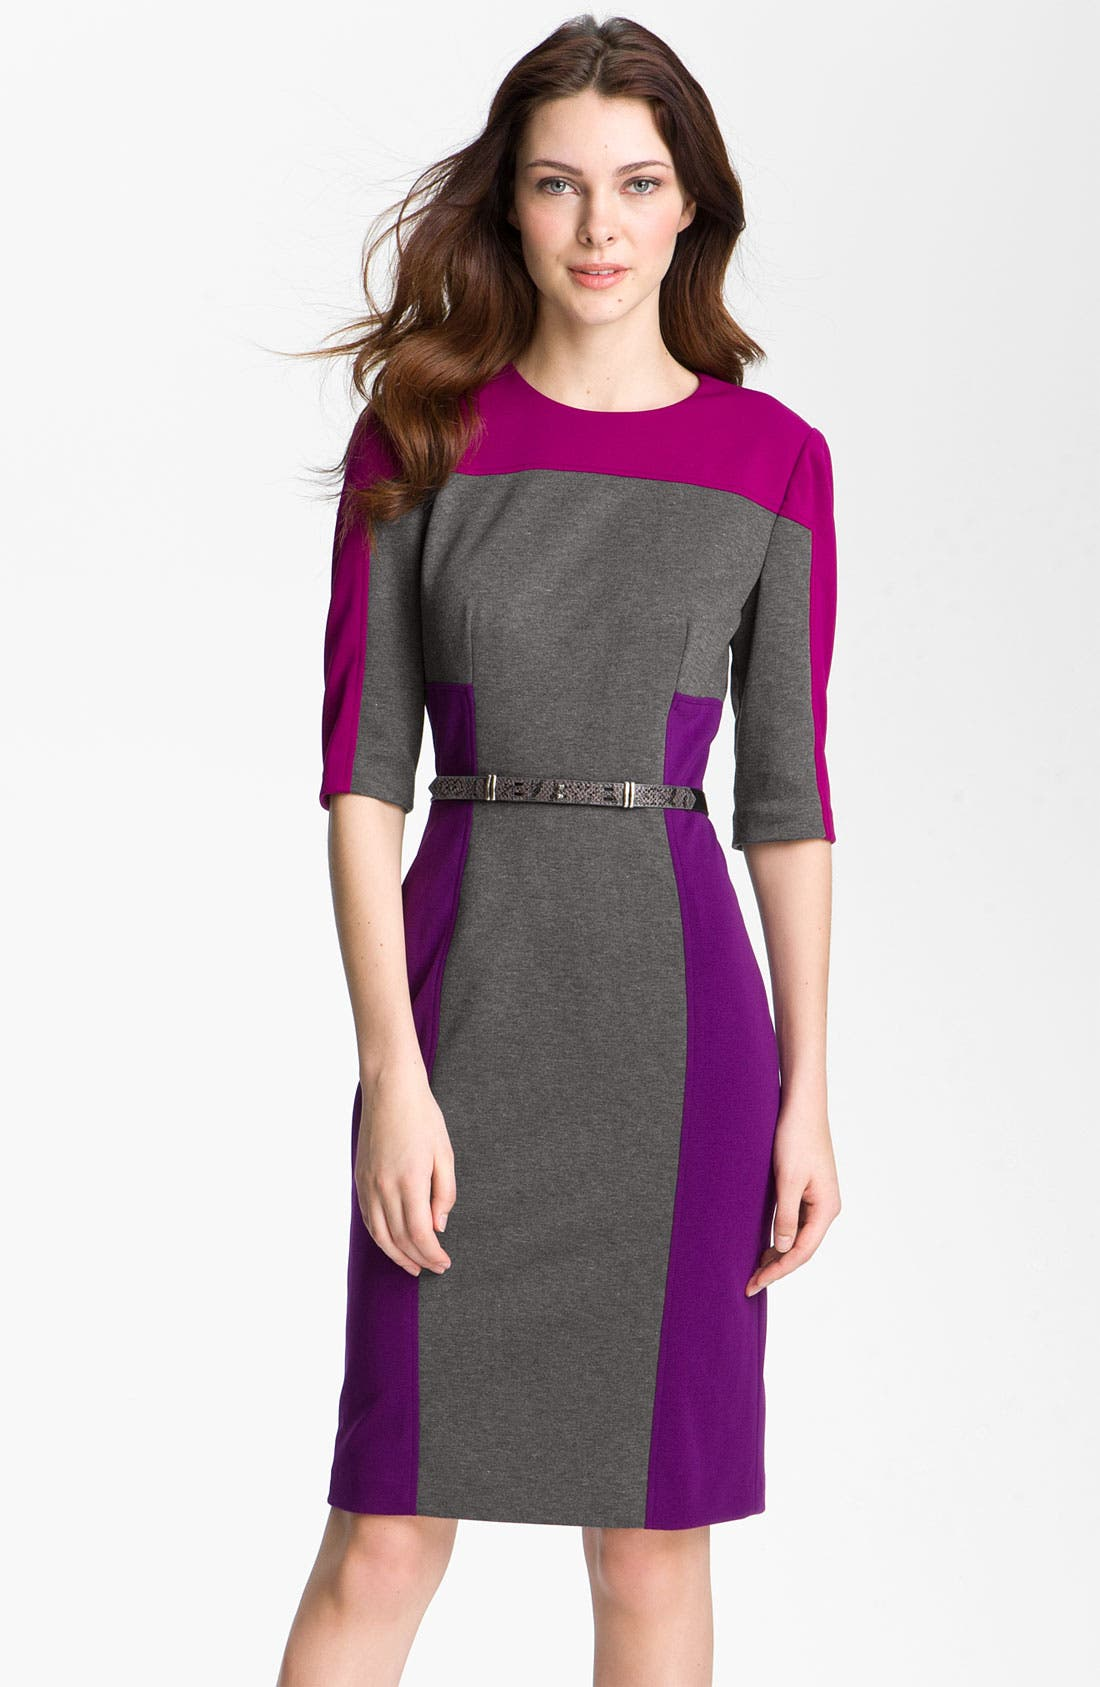 Alternate Image 1 Selected - Maggy London Colorblock Ponte Sheath Dress (Petite)